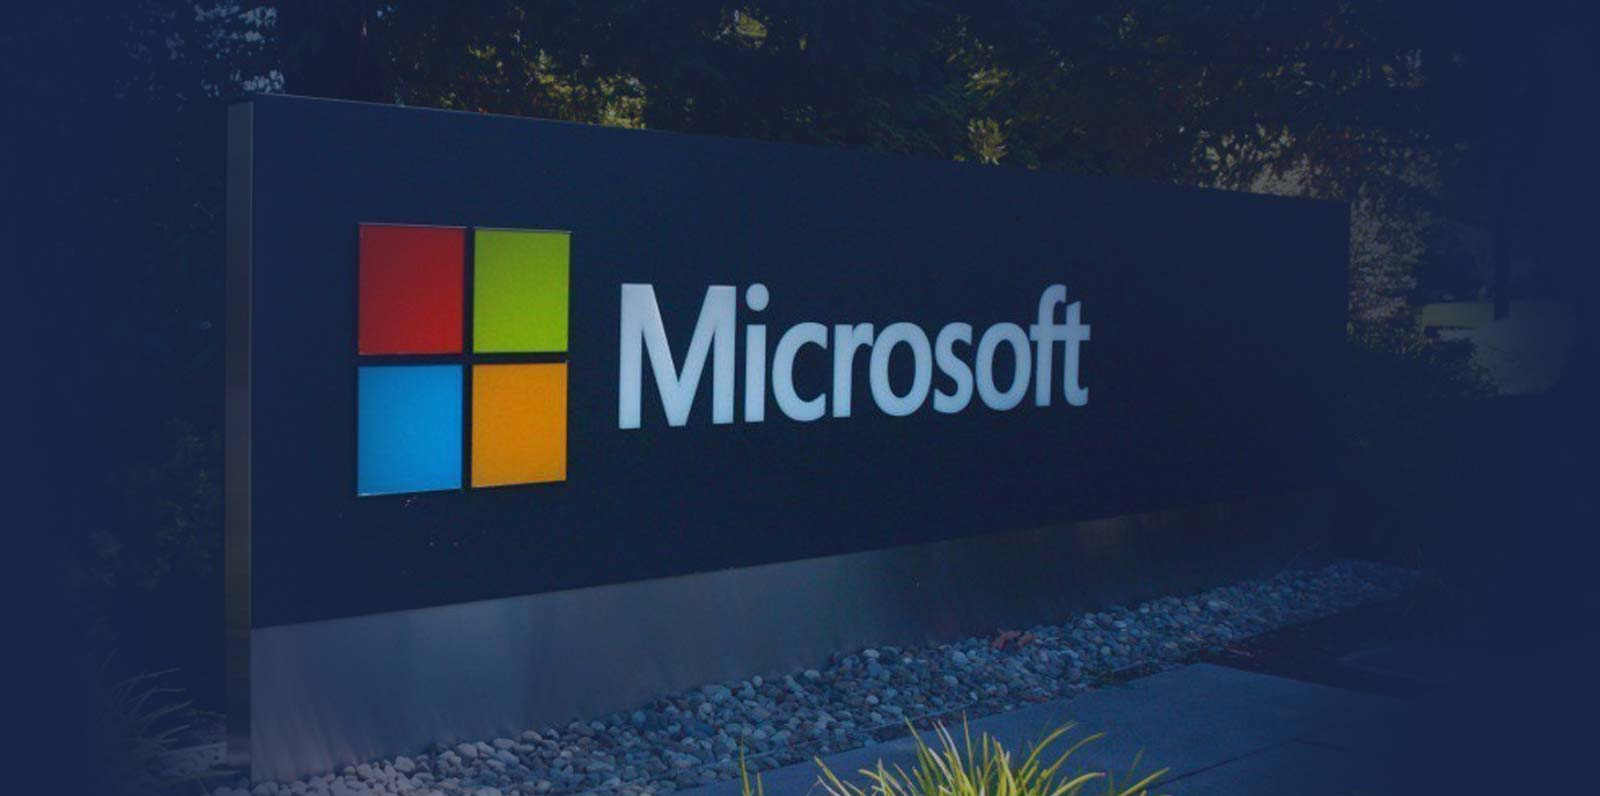 Microsoft donates $1 Billion to Nonprofits in Cloud Services